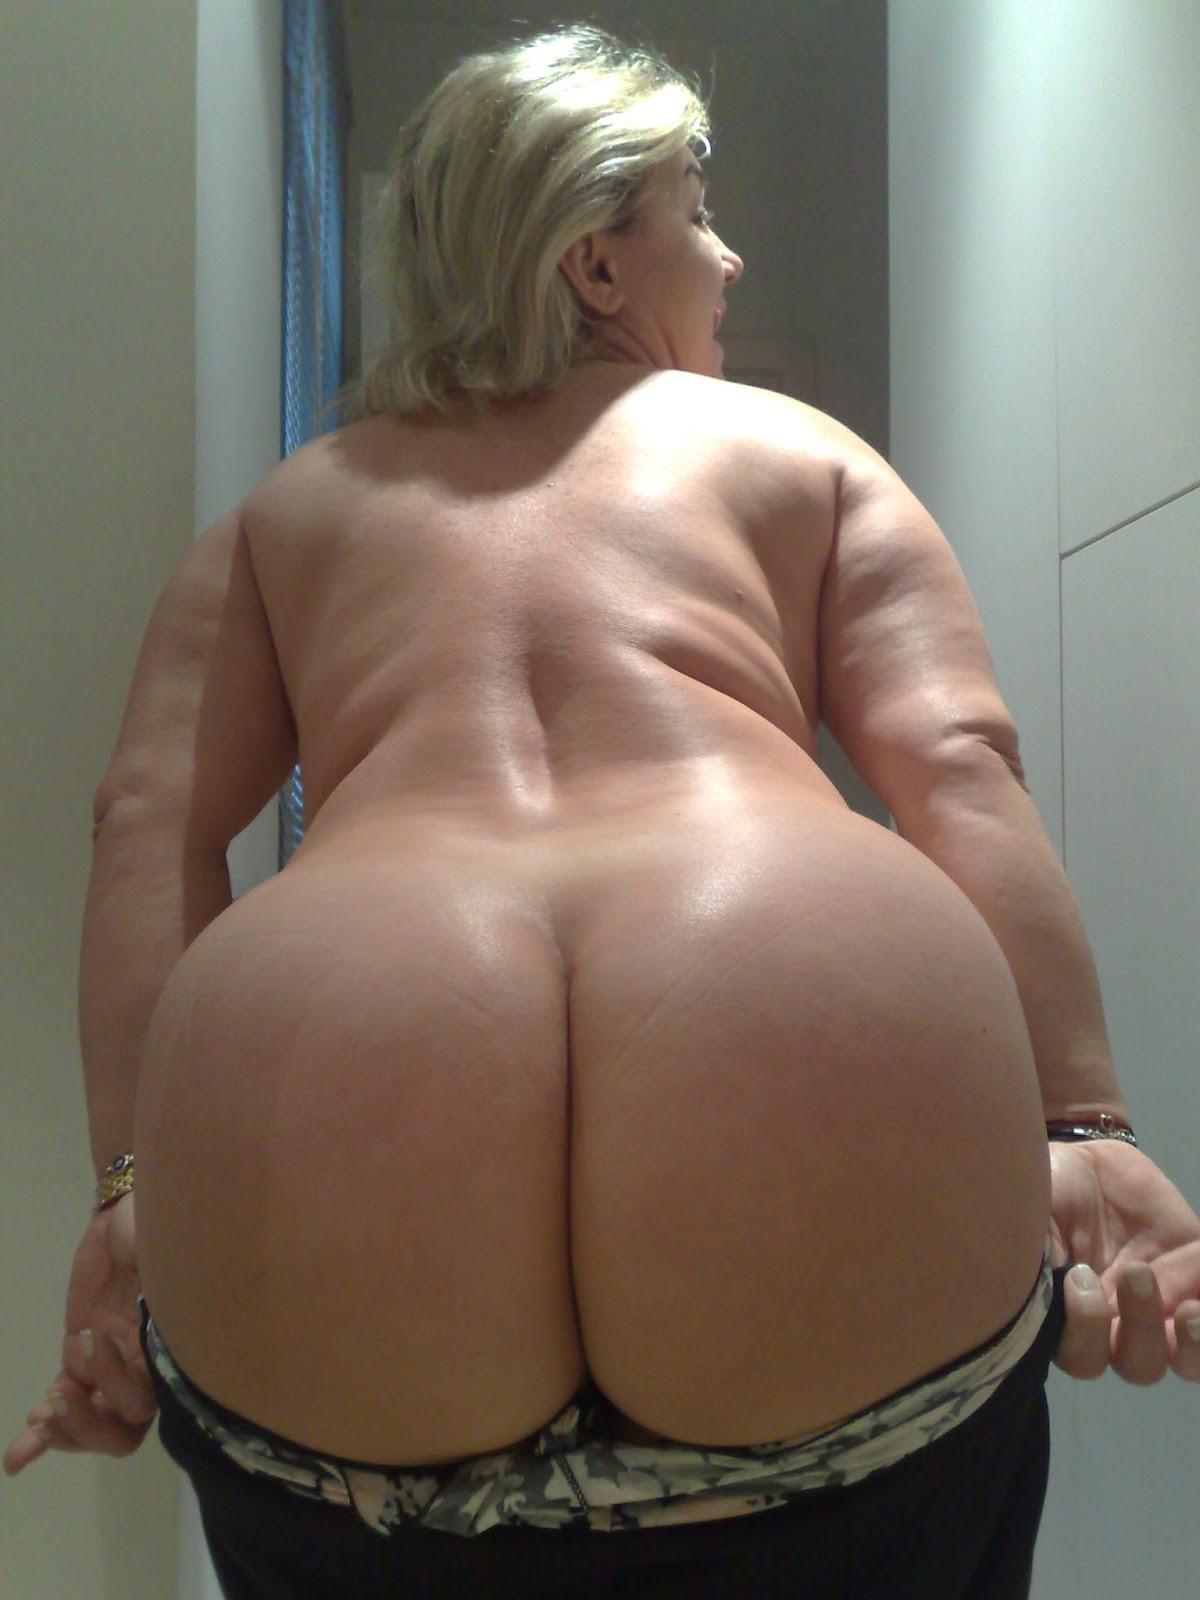 Big butt witch porn pics sex images